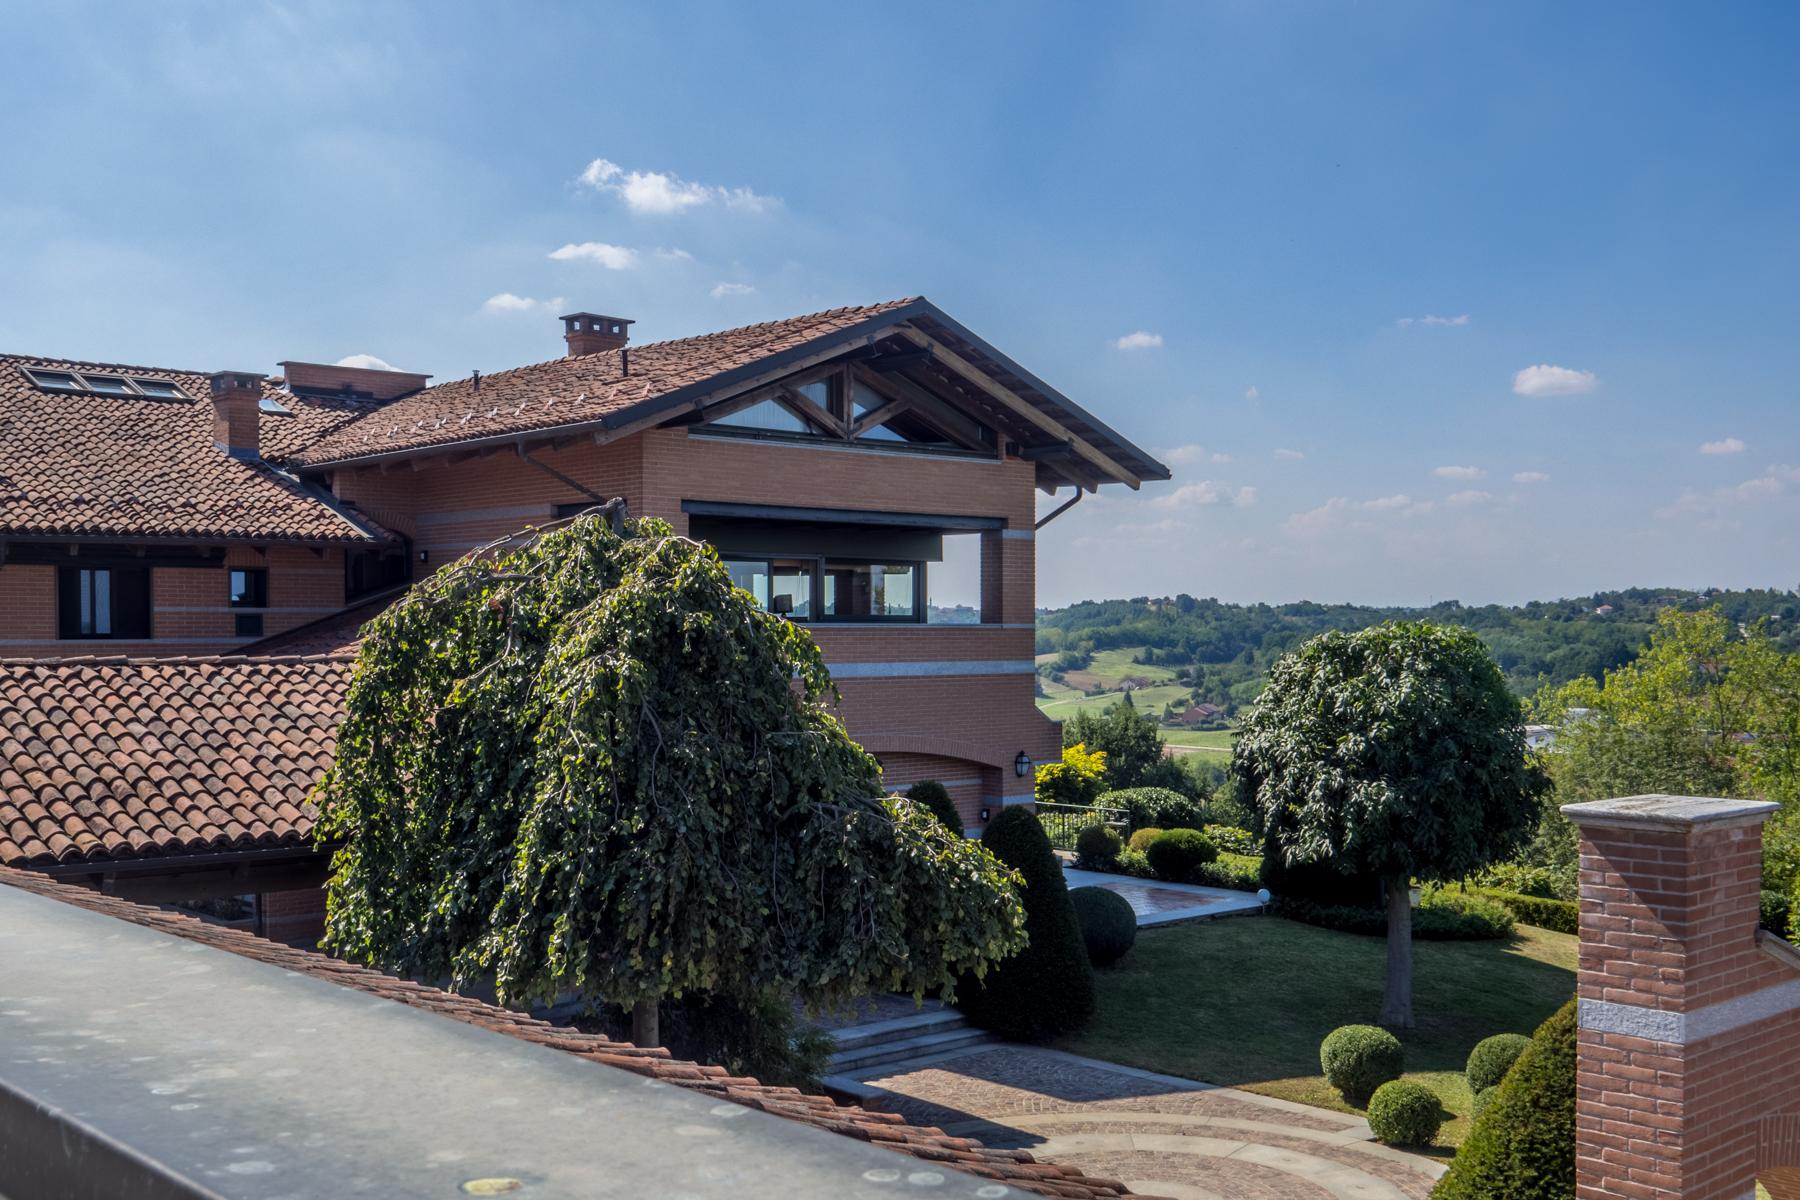 Villa in Vendita a Cantarana: 5 locali, 700 mq - Foto 22